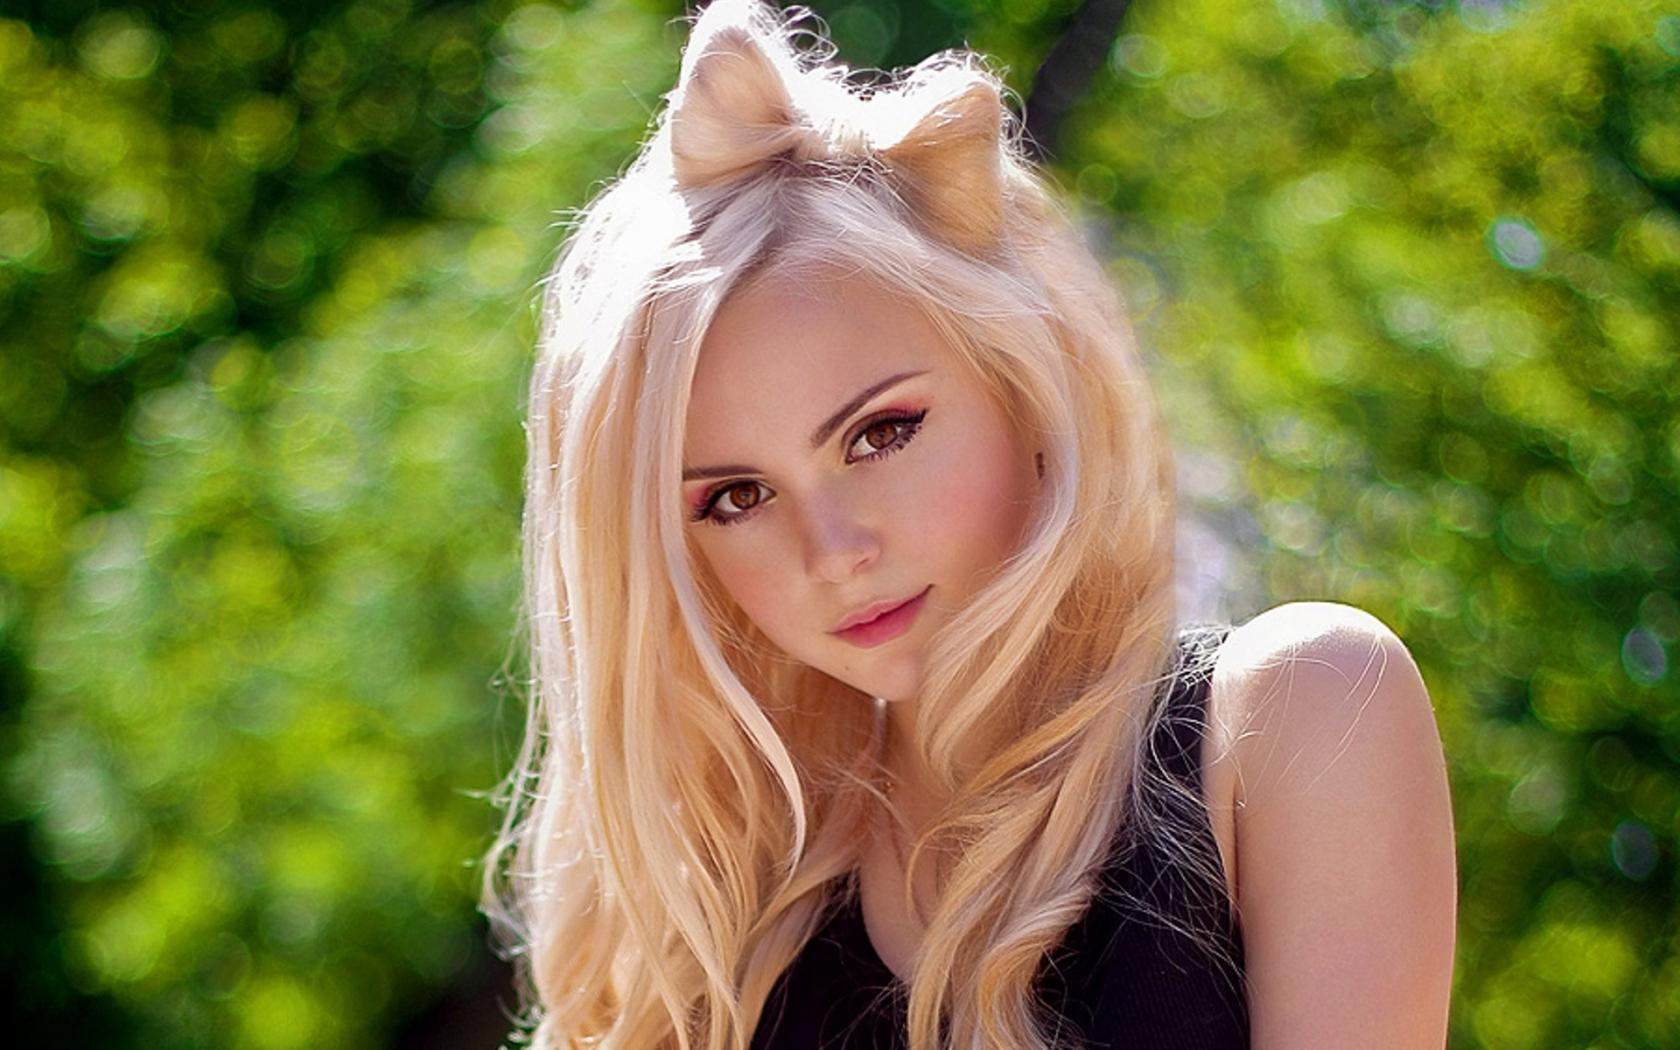 image - cute girl 23 backgrounds wallpaper | disney wiki